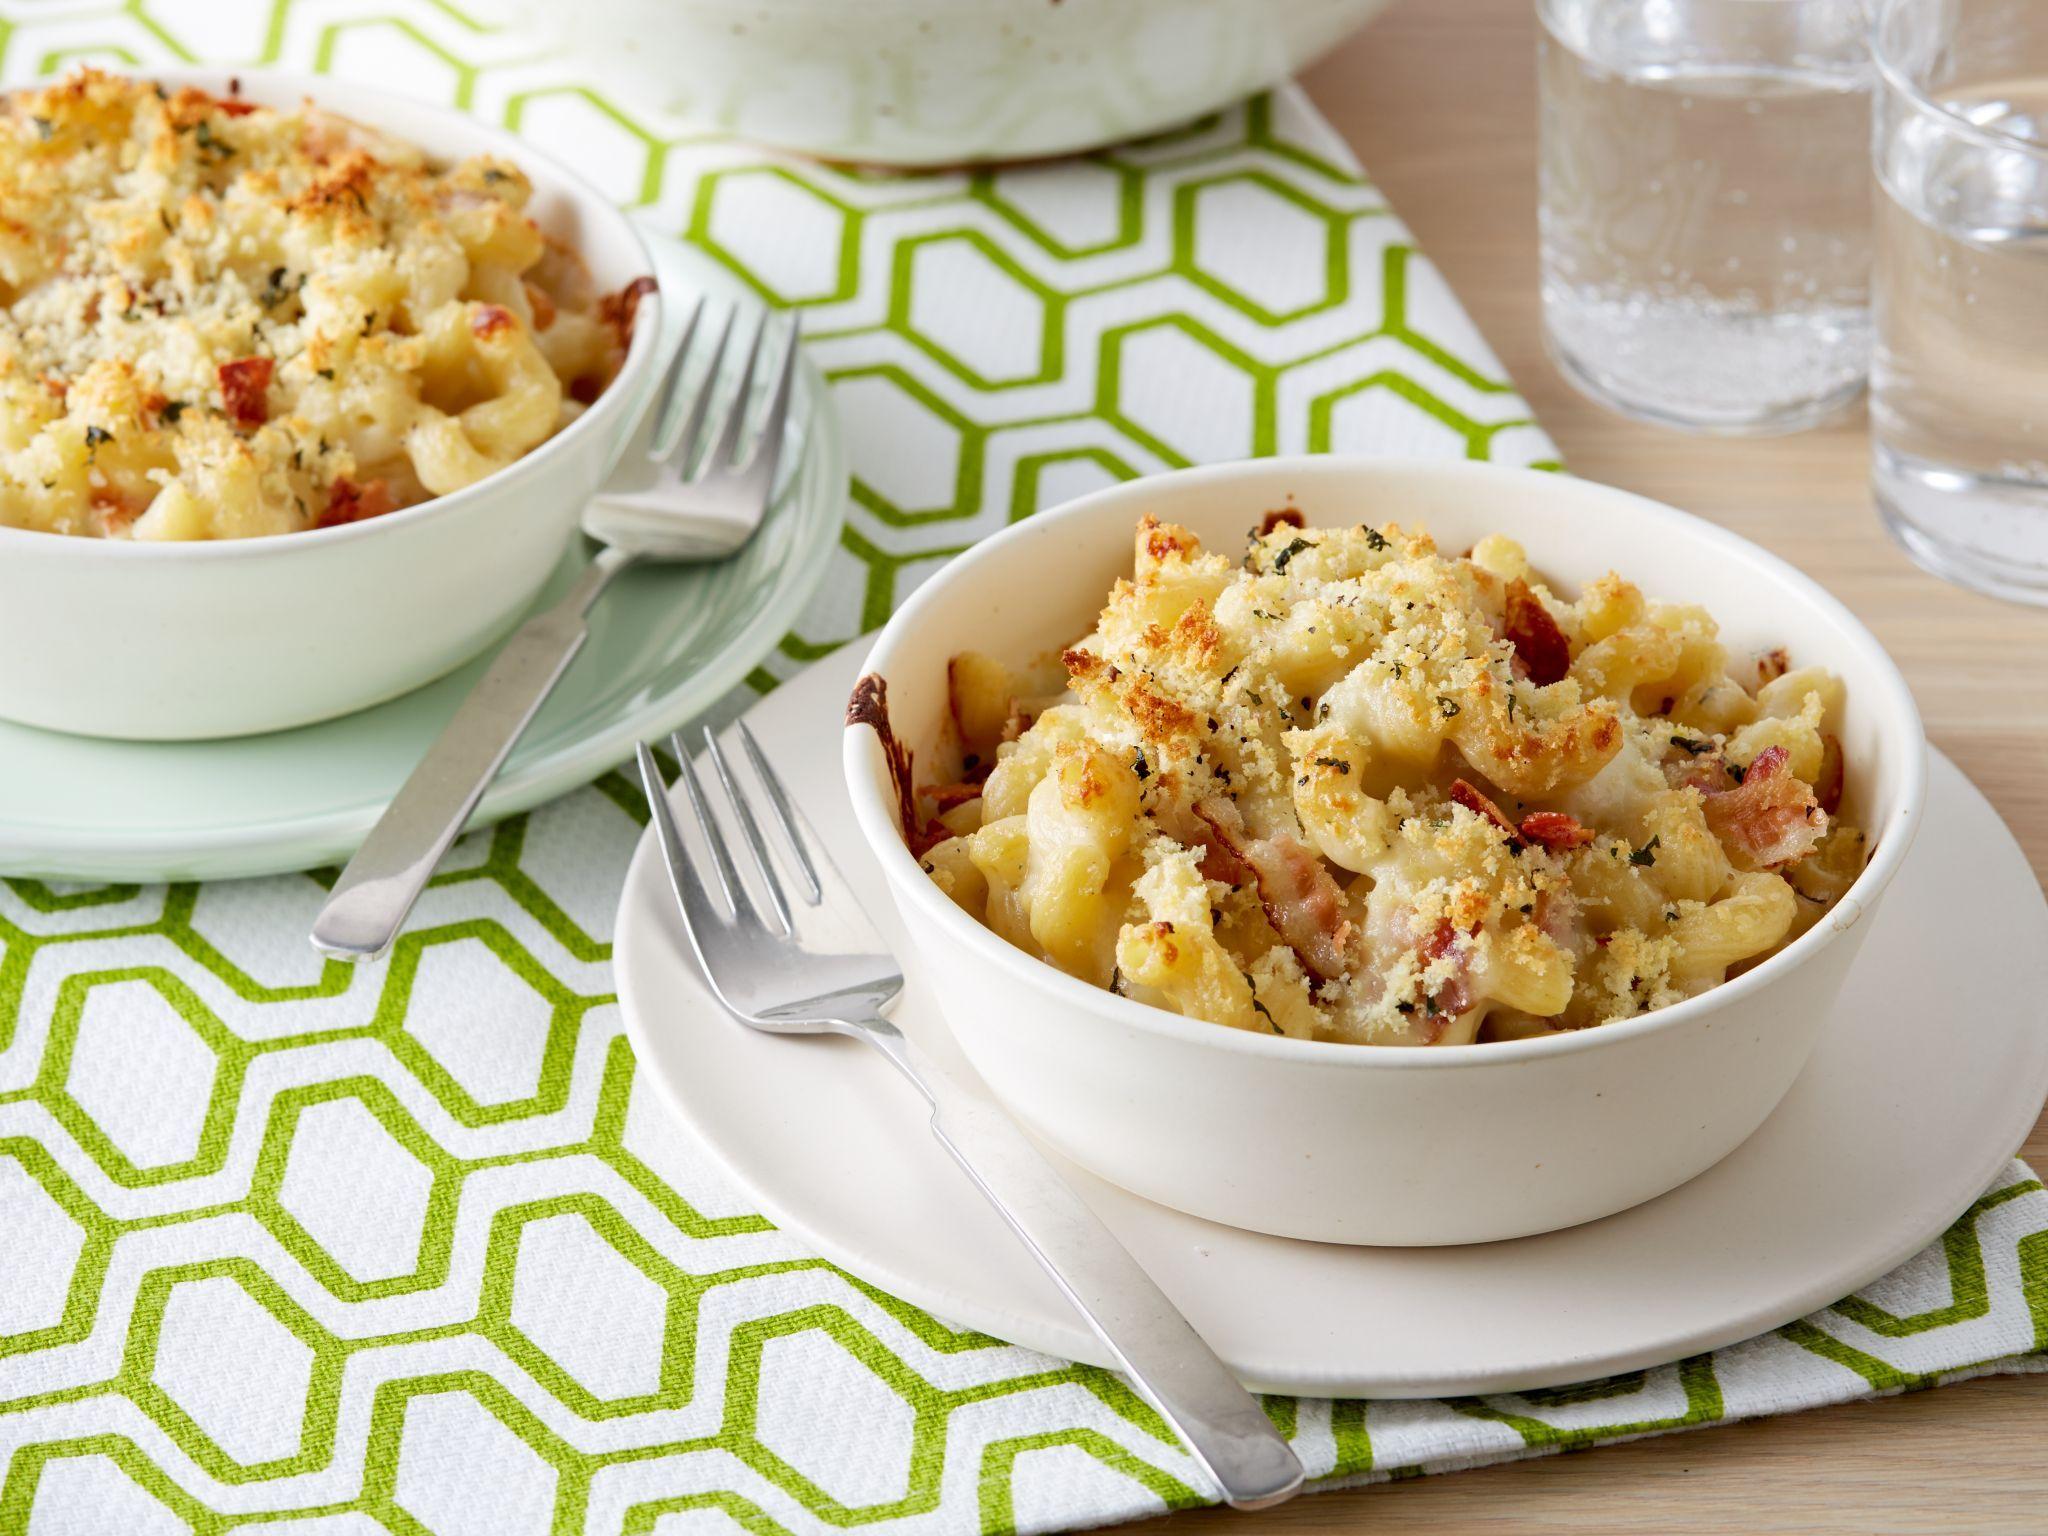 Lobster Mac And Cheese Ina Garten grown up mac and cheese | recipe | ina garten, bacon and barefoot